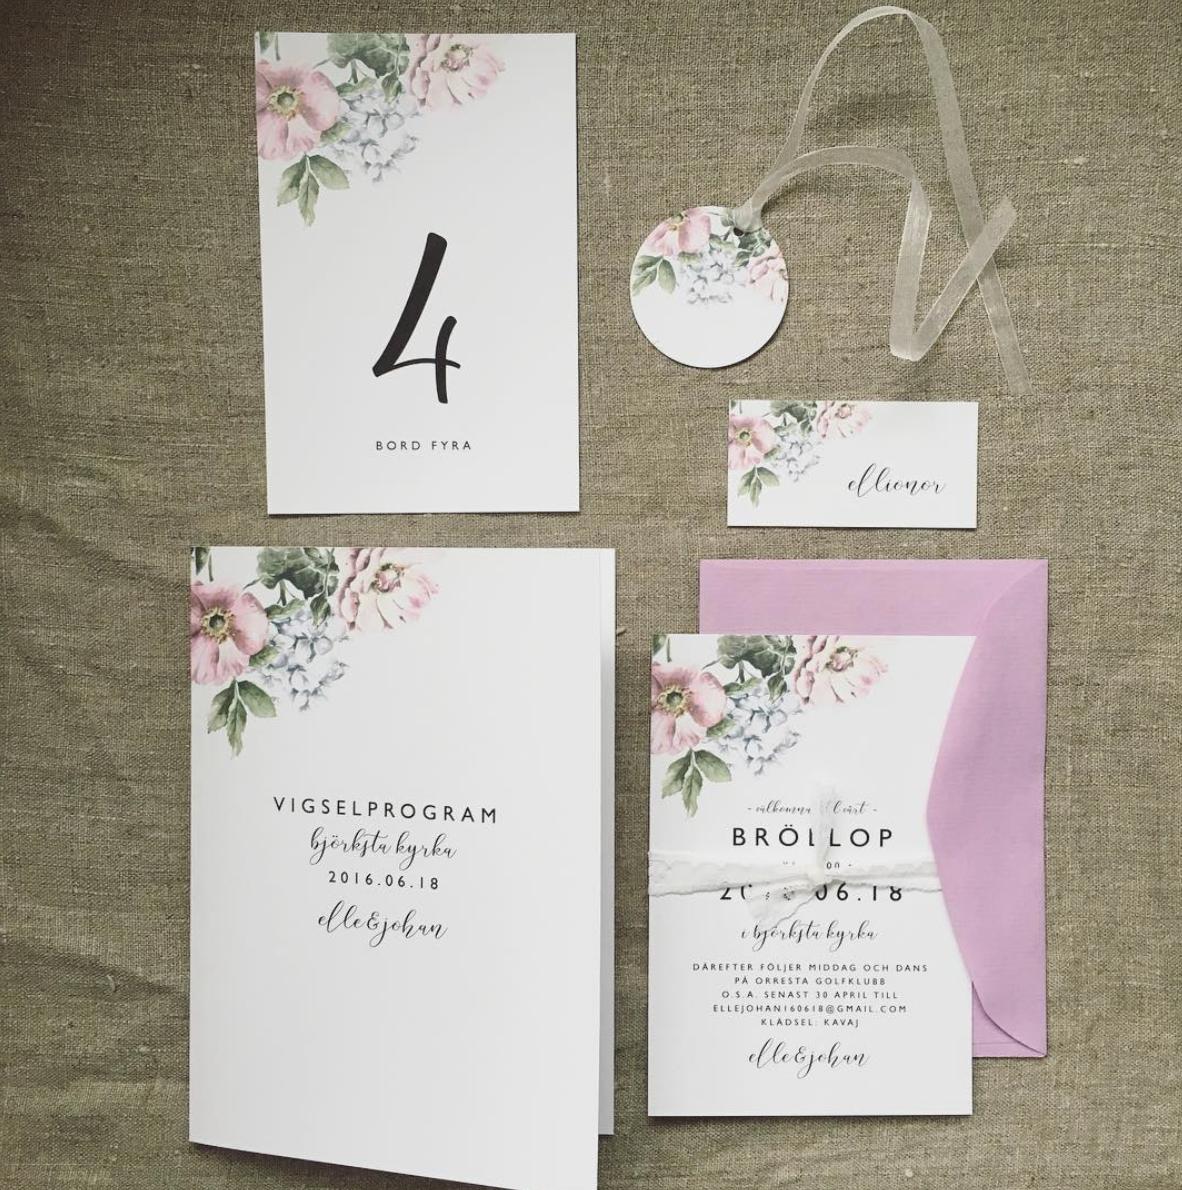 871955ec465d ... trycksaker till bröllop, inbjudningskort, vigselprogram, bordsnummer,  placeringskort, pastell, sommarbröllop, blomster - www.annagorandesign.se